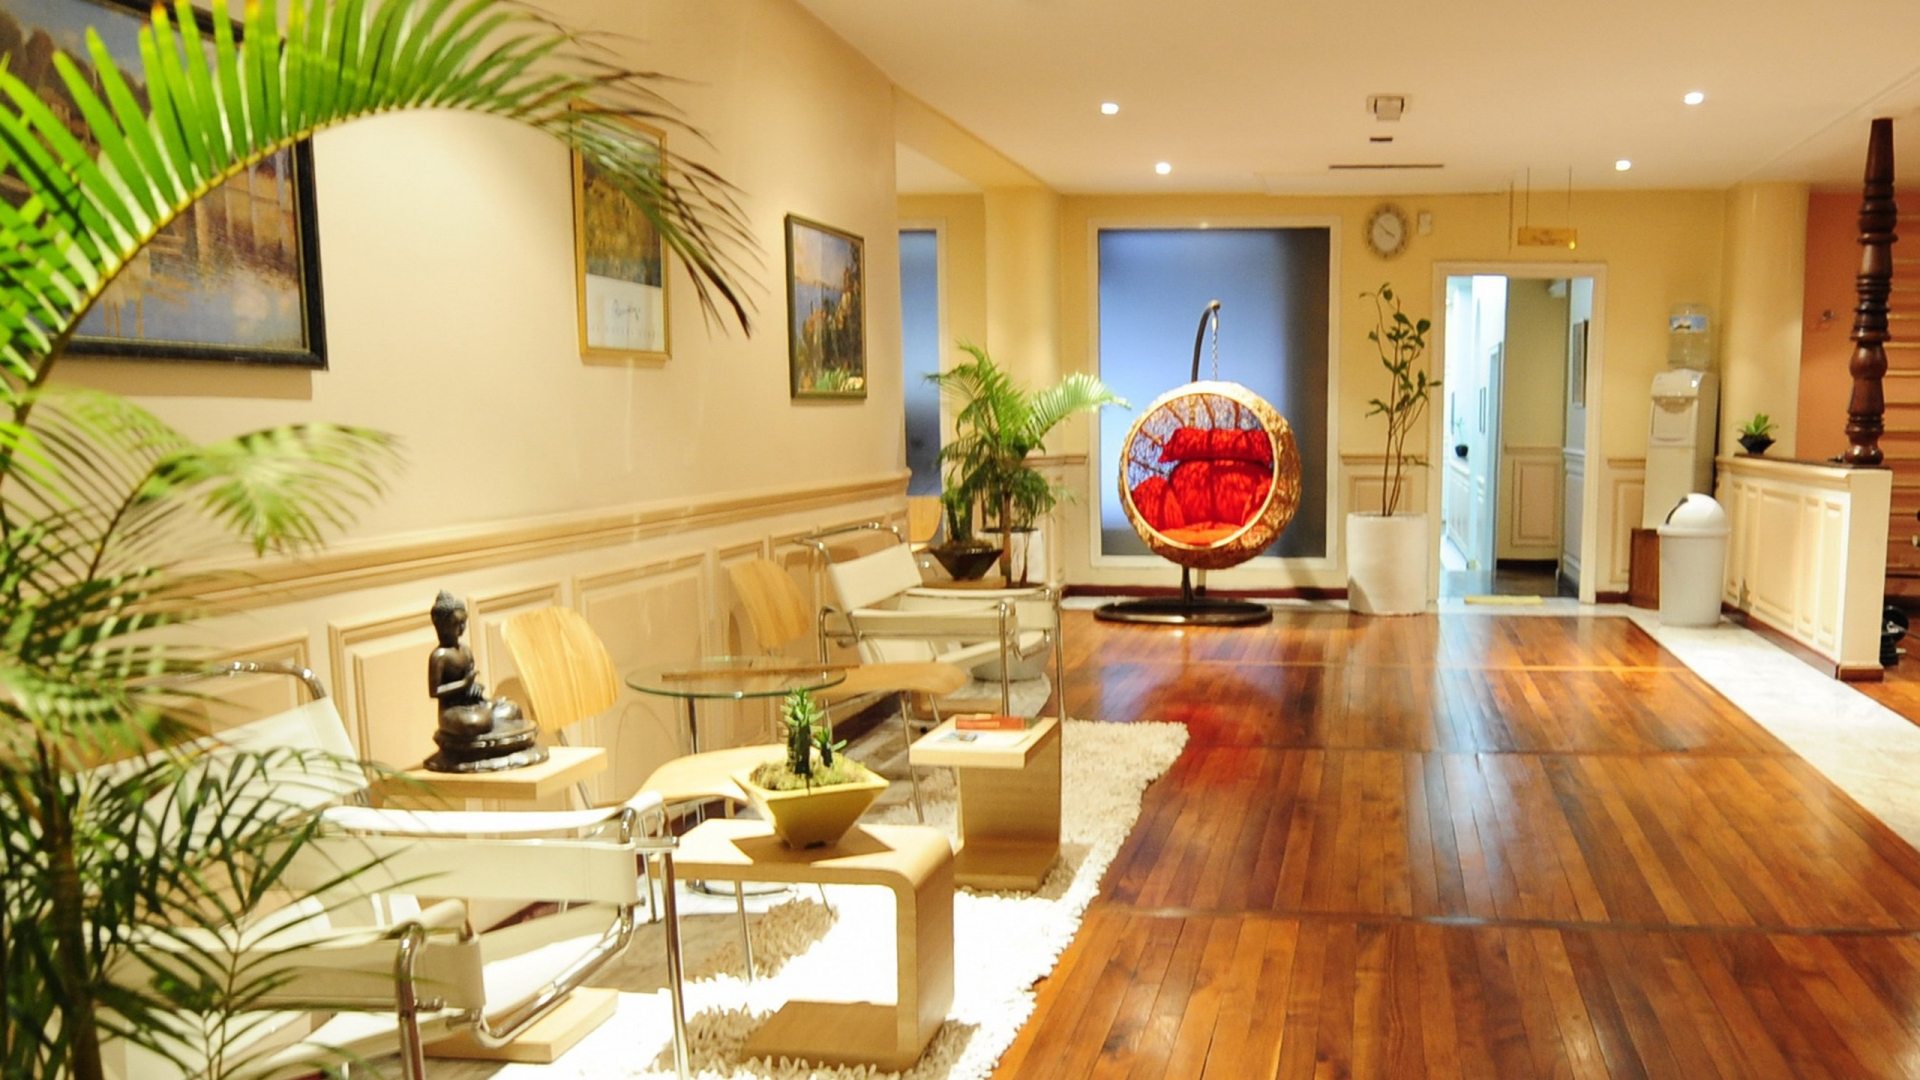 Diseno De Interiores Hd Of Sala Es Espera De Hotel Hd 1920x1080 Imagenes